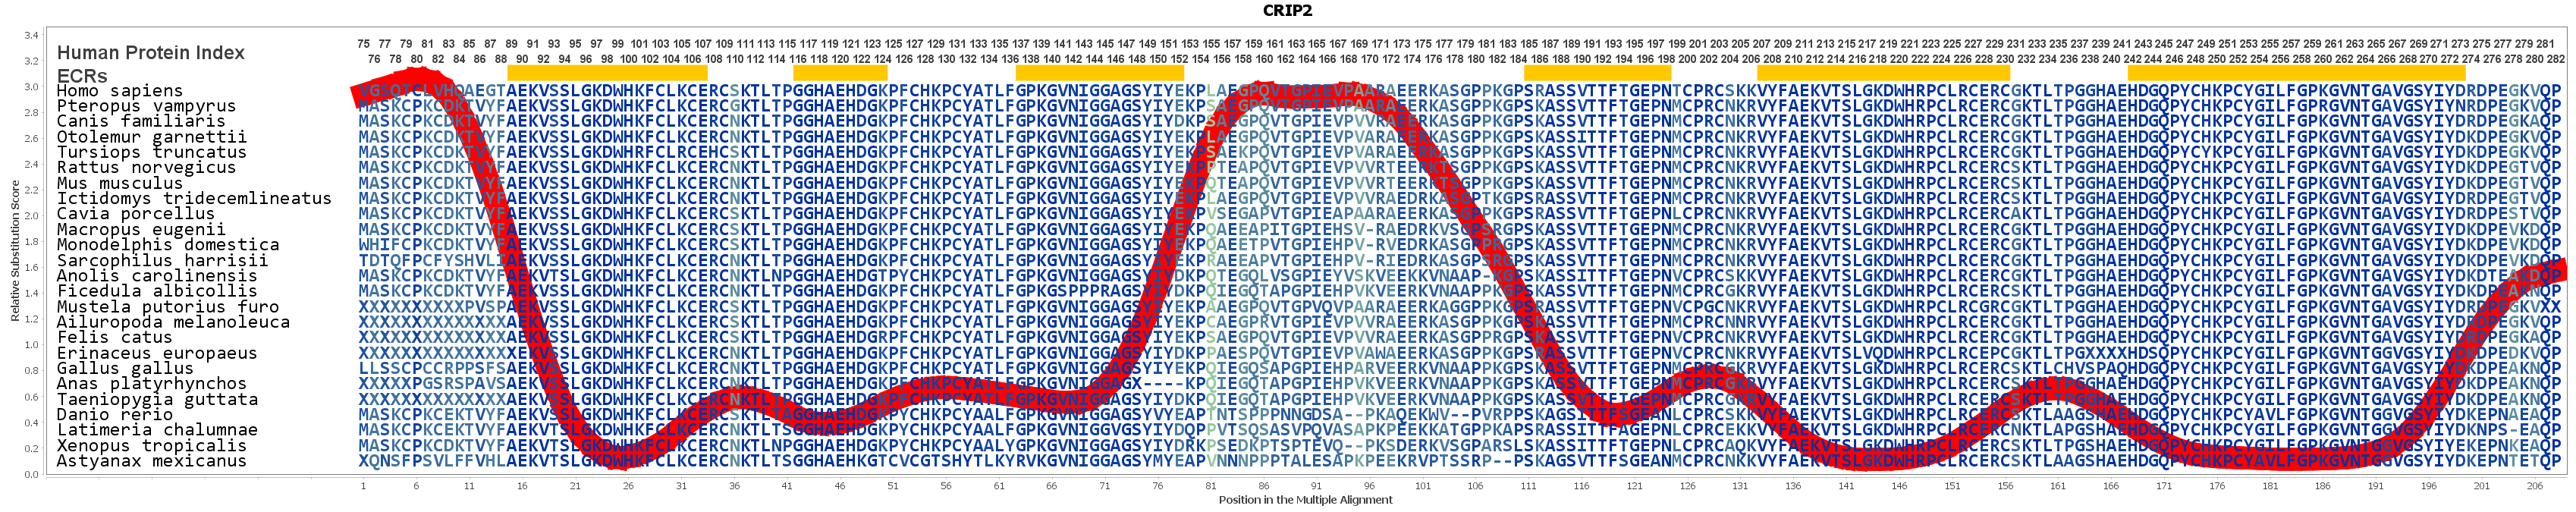 CRIP2 Gene - GeneCards | CRIP2 Protein | CRIP2 Antibody